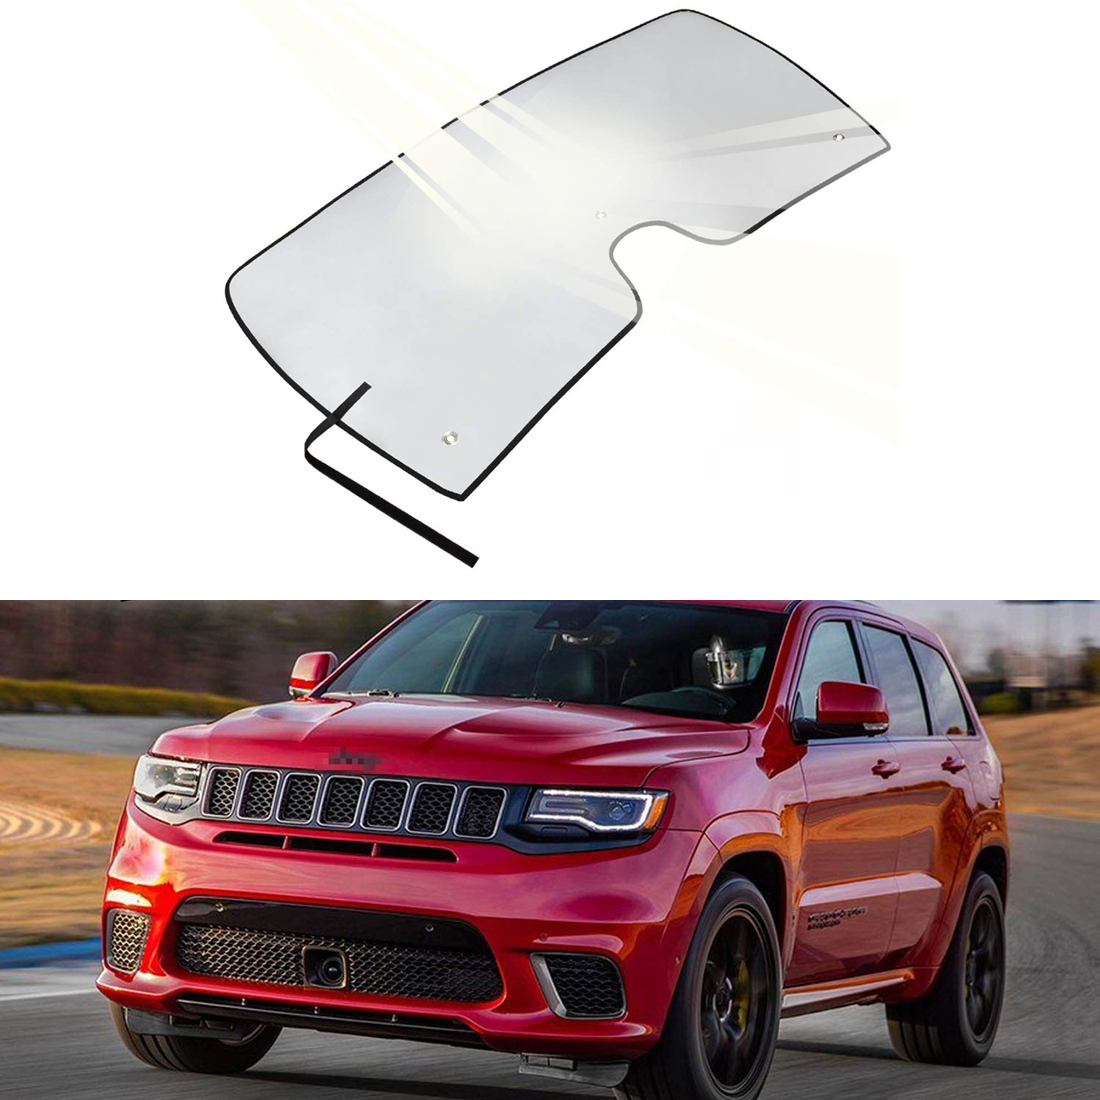 Car Windshield Sun Shade Blocks UV Rays Sun Visor Protector Automotive Reflective Folding Window/Sunshade Compatible for Jeep Grand Cherokee SUV 2011-2018